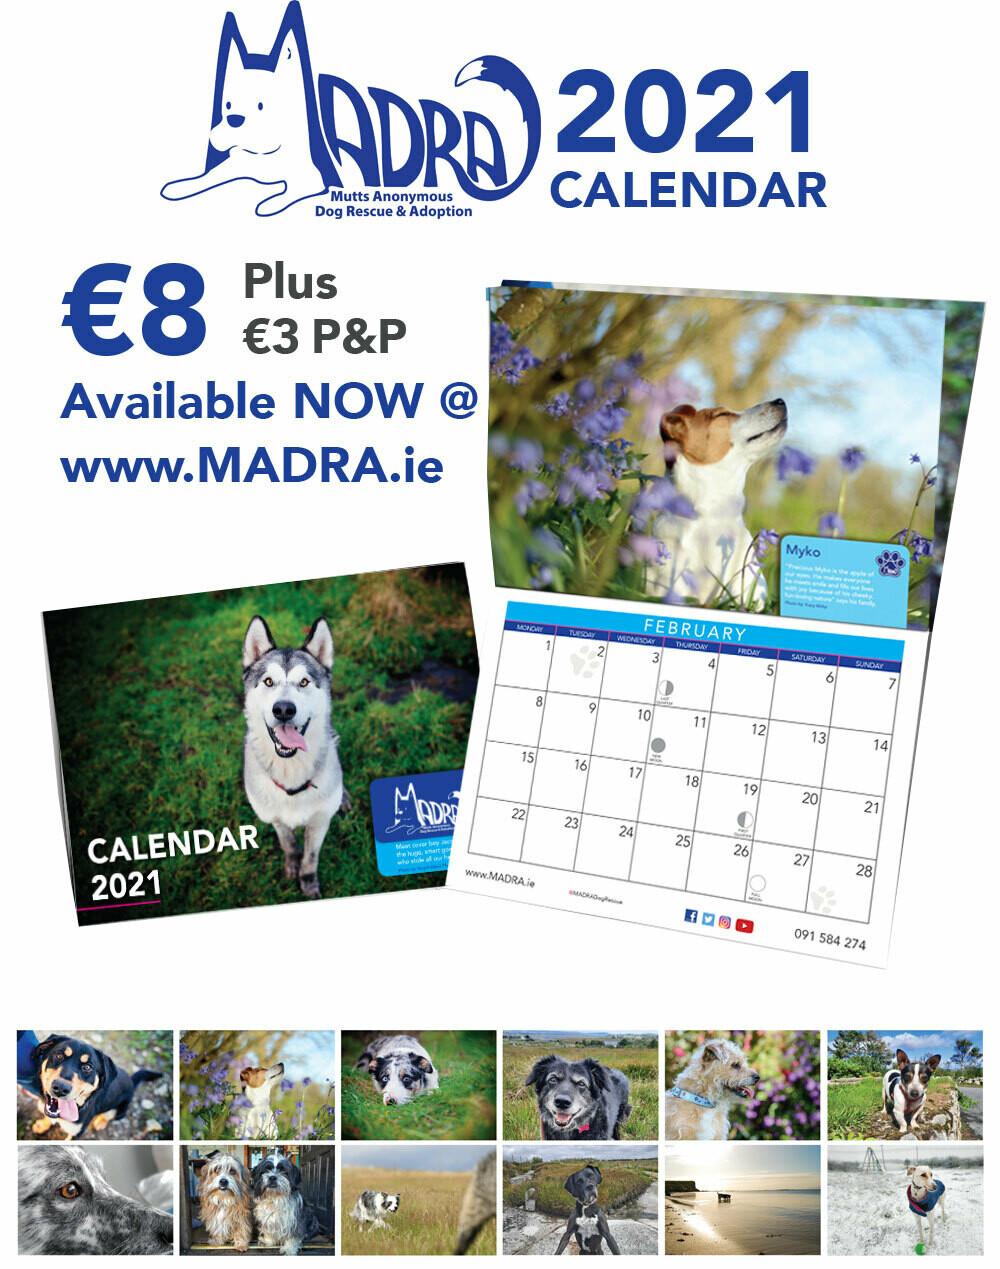 2021 Calendar - NOW IN-STOCK!